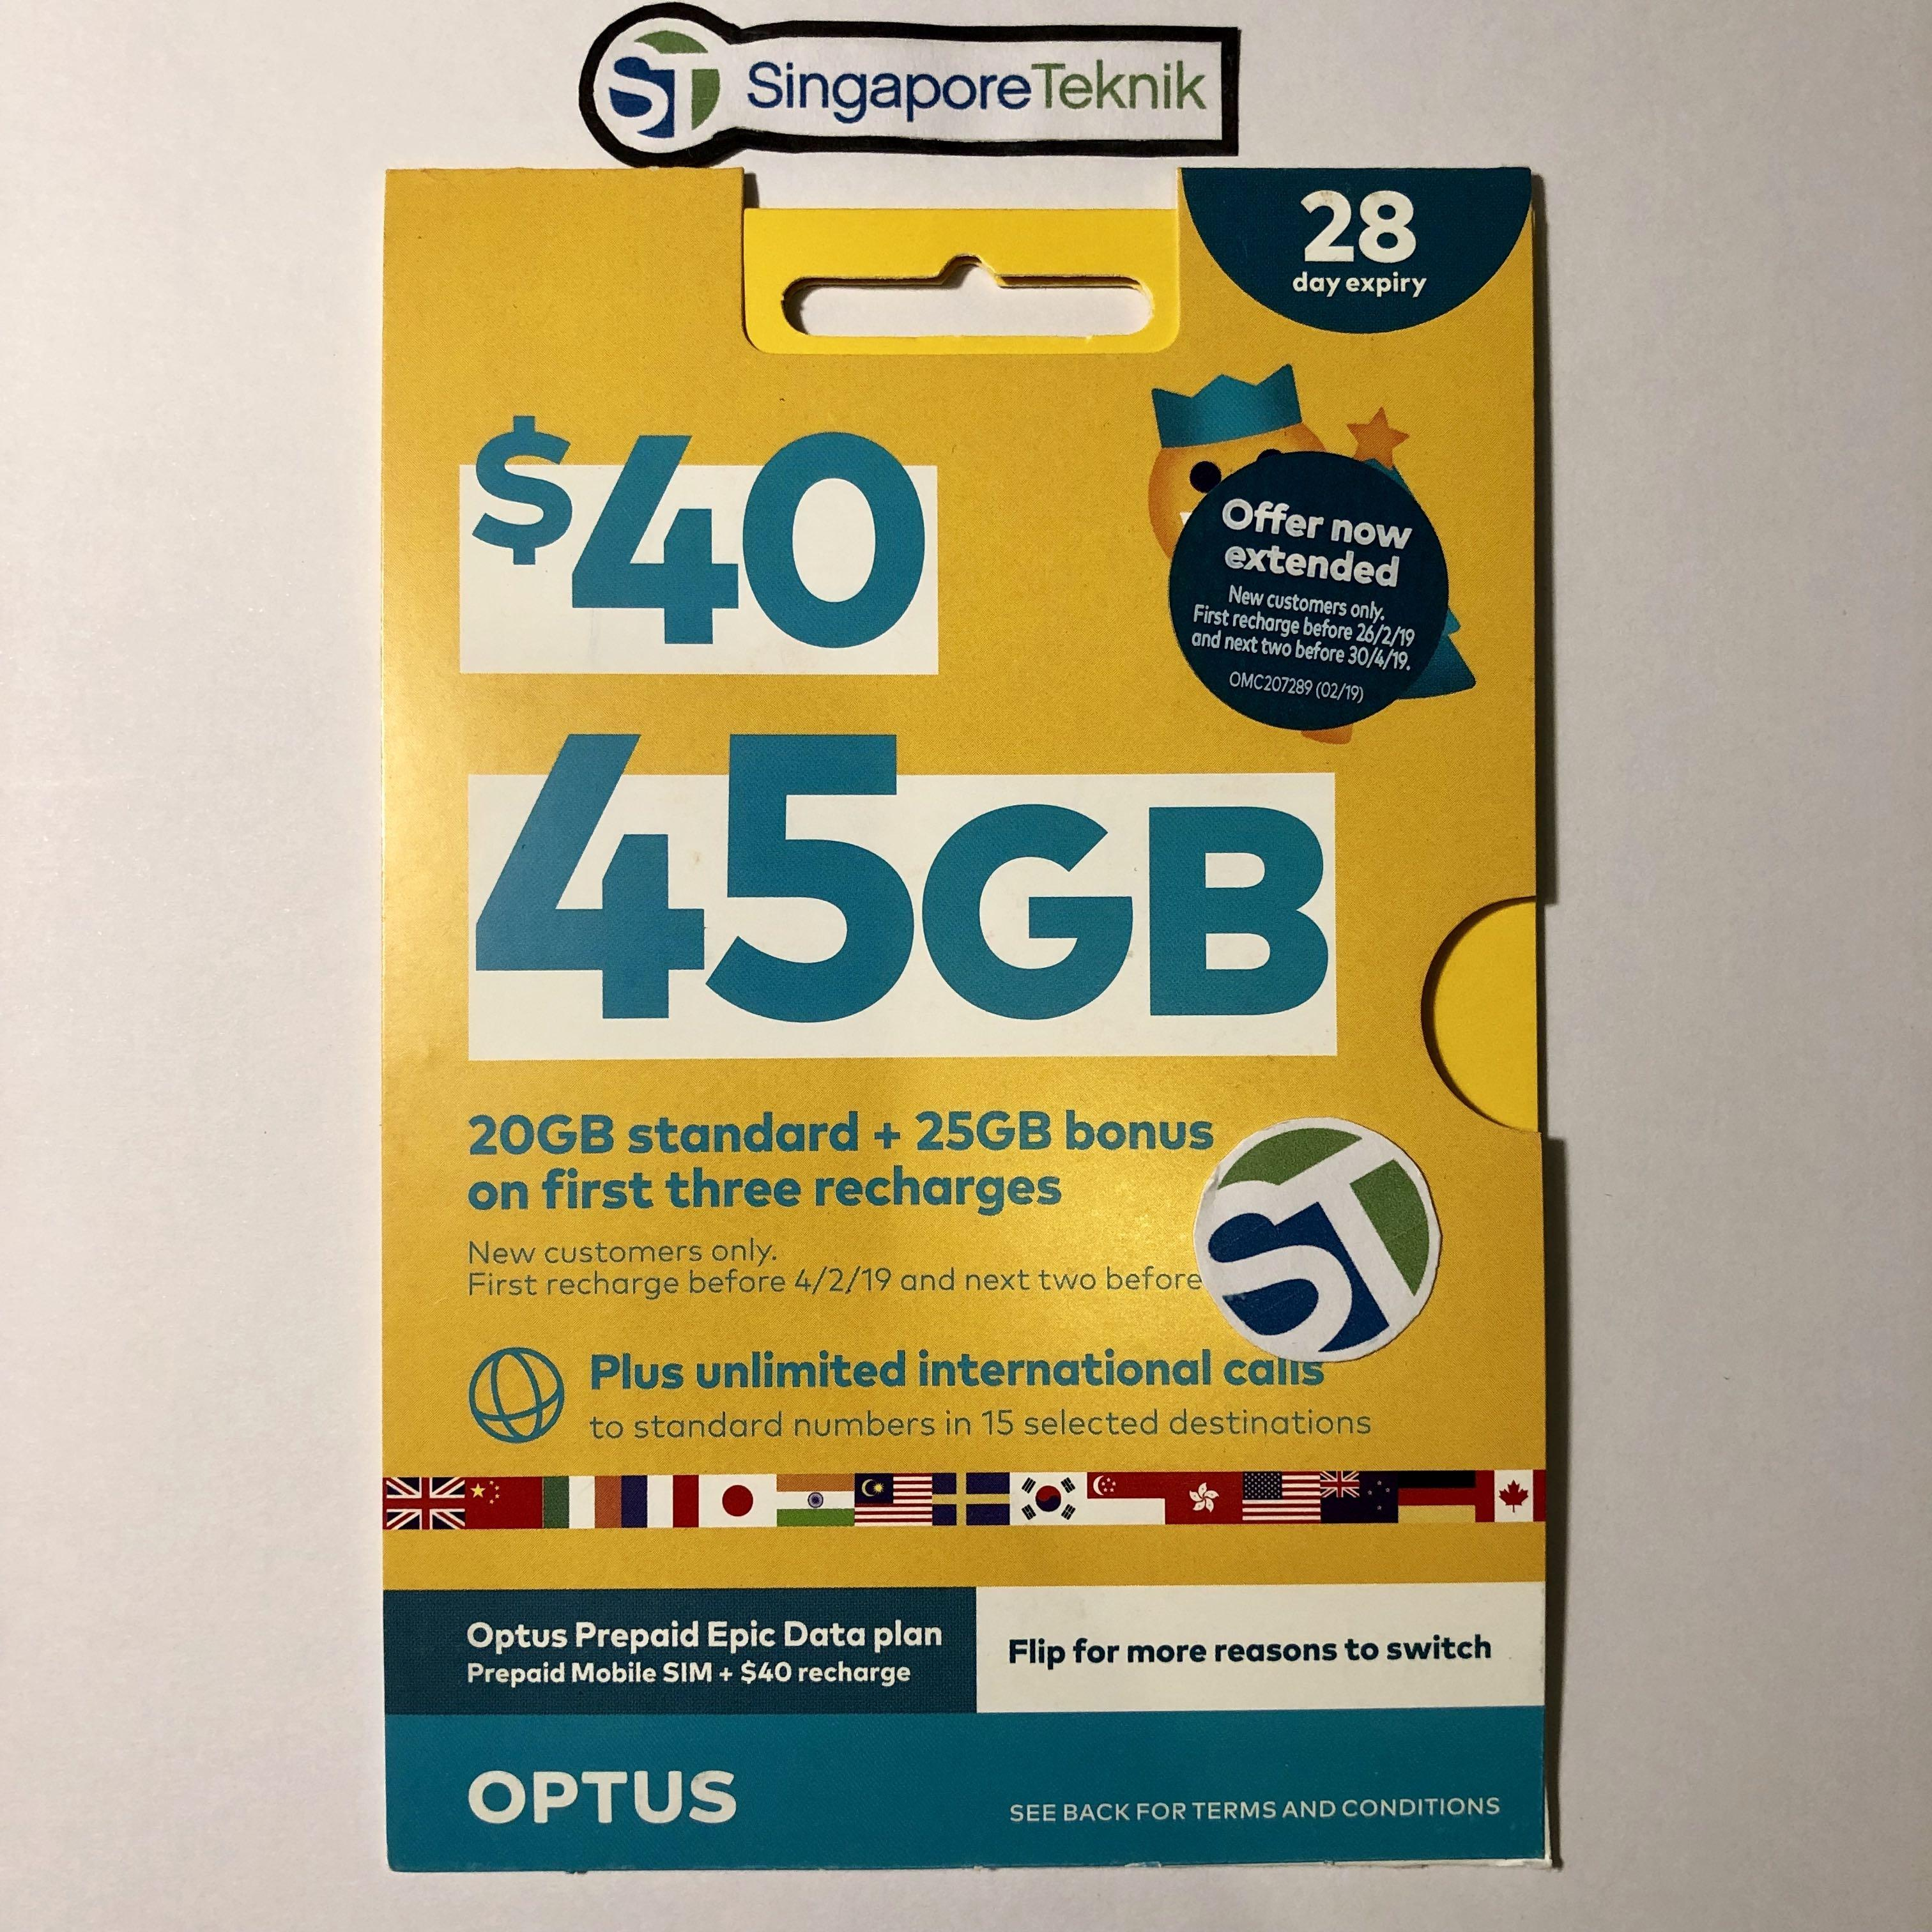 45gb Australia Prepaid Sim Data Card 28d Optus Aus Oz Mobile Free 4g Int Call Starter Nano Dataroam By Sgteknik.